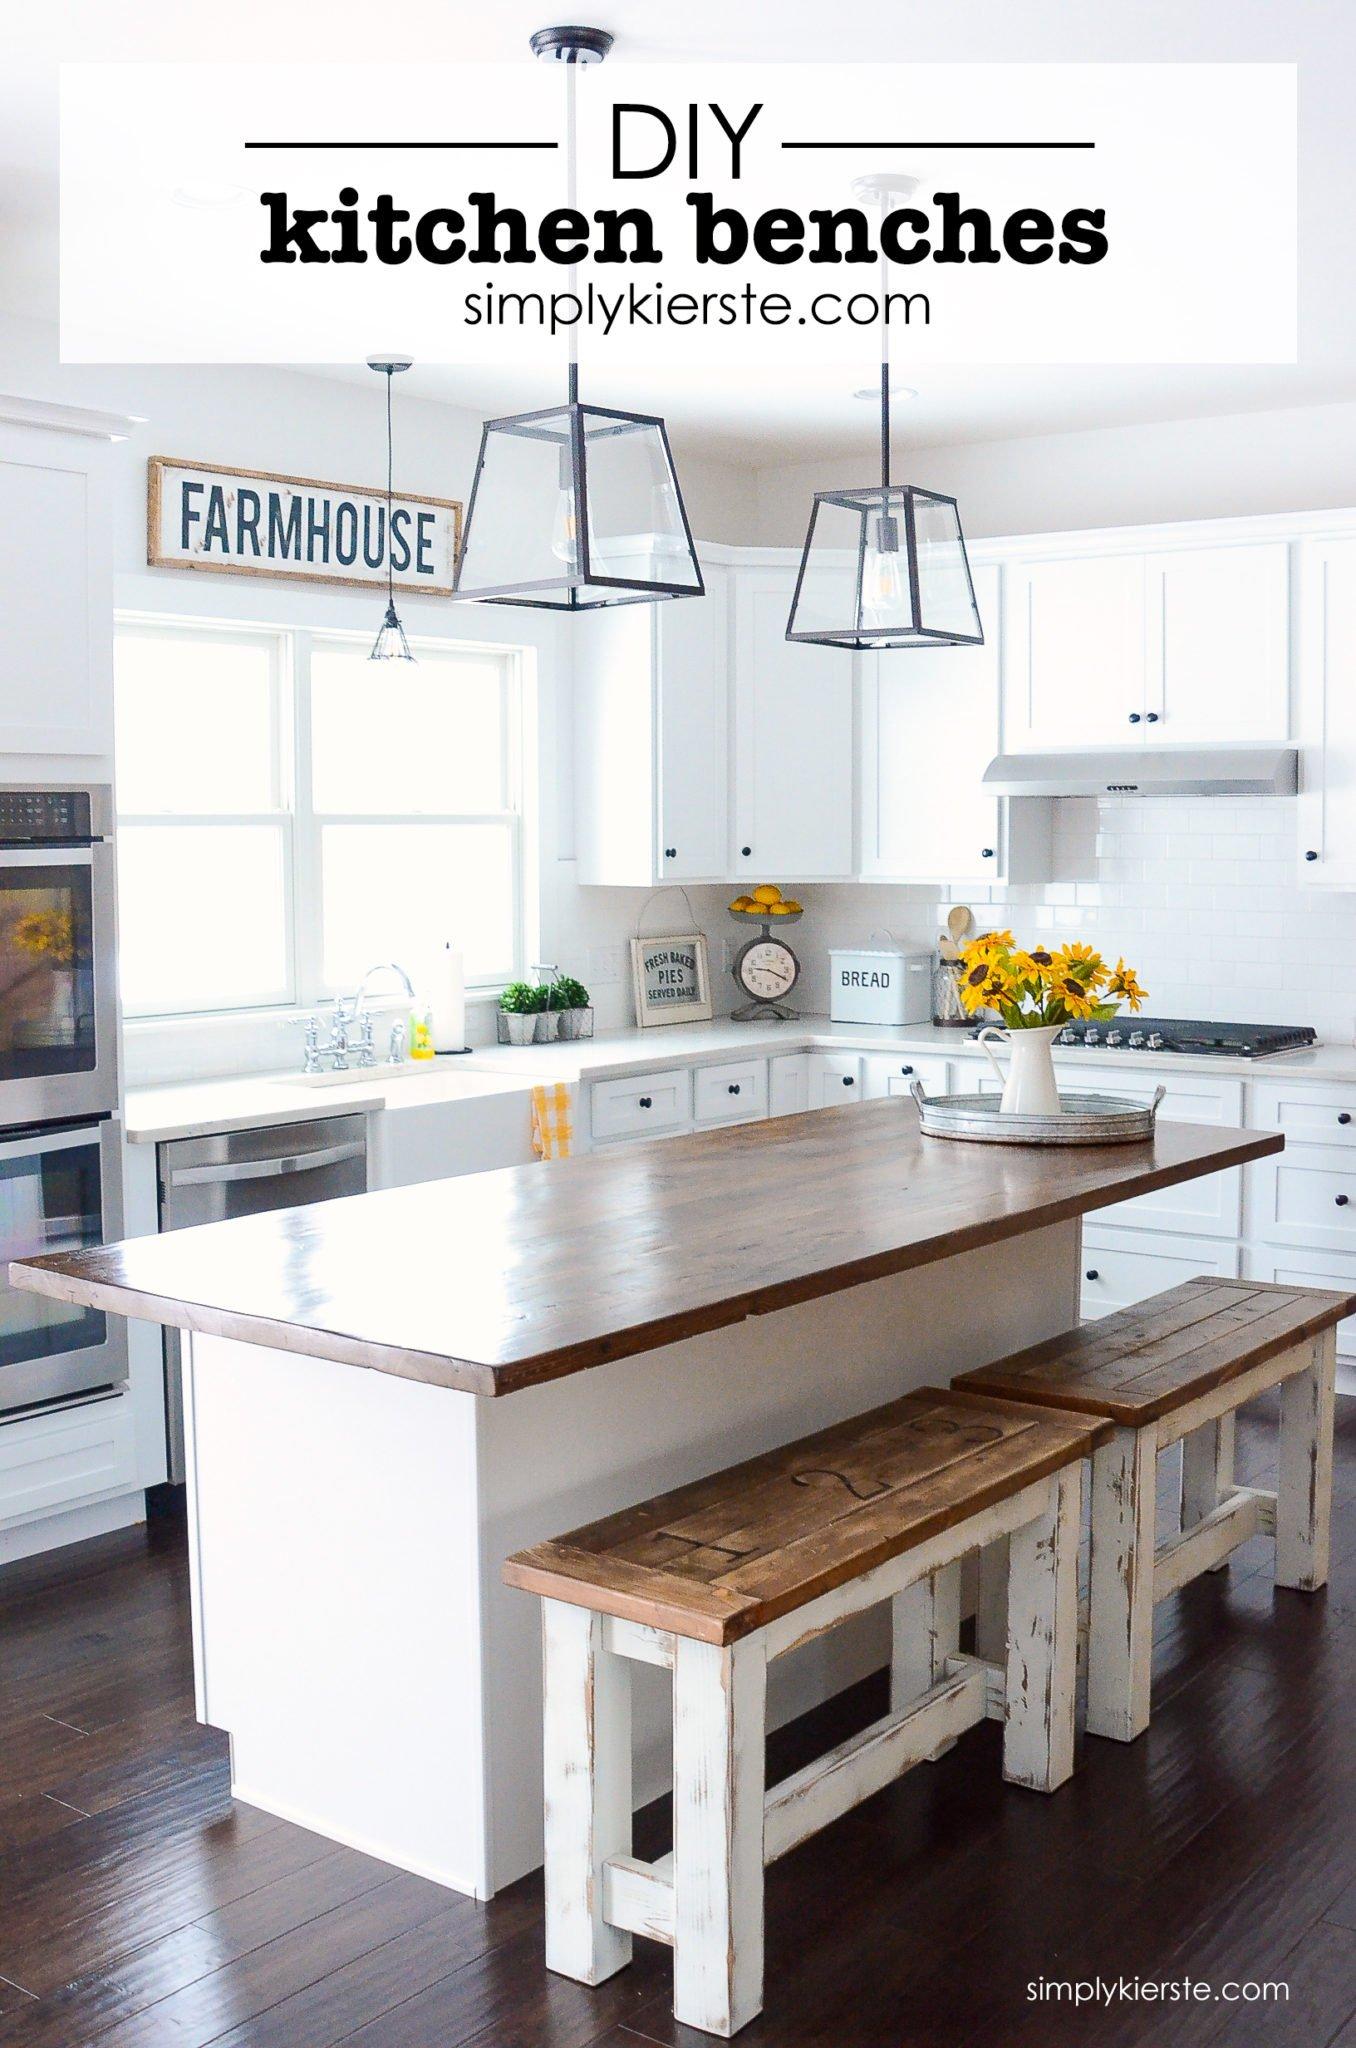 Diy Kitchen Benches Simply Kierste Design Co